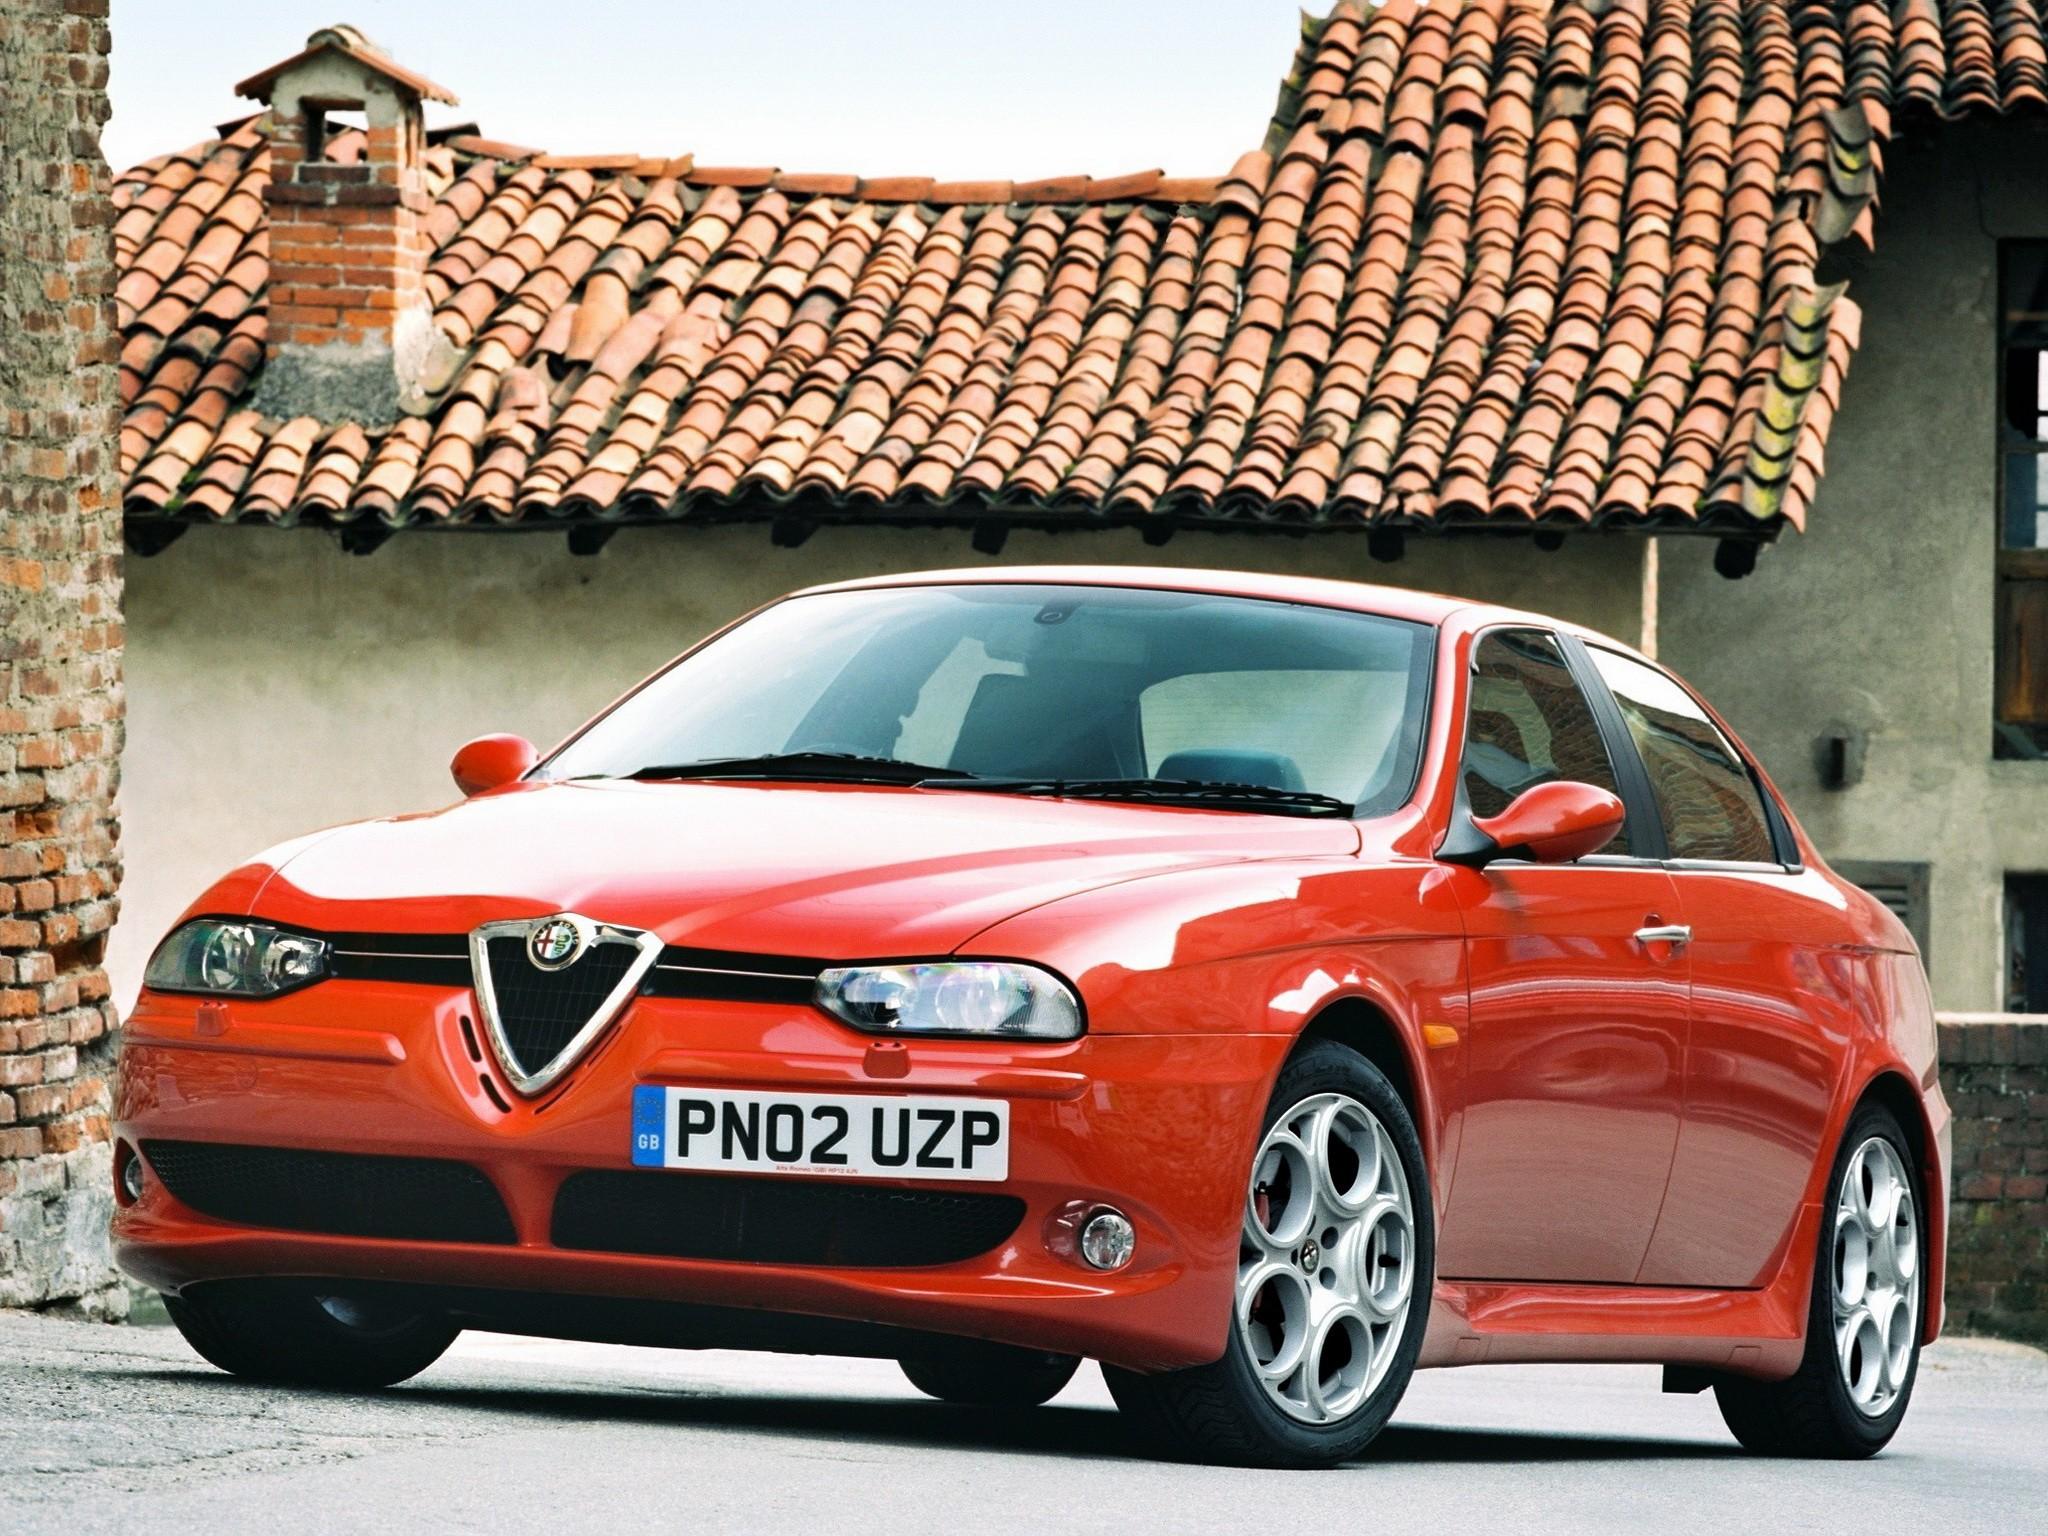 Headerintro Photo further  furthermore Alfa Romeo Gta besides Alfa Romeo Gta in addition Gta. on alfa romeo gta spider cars